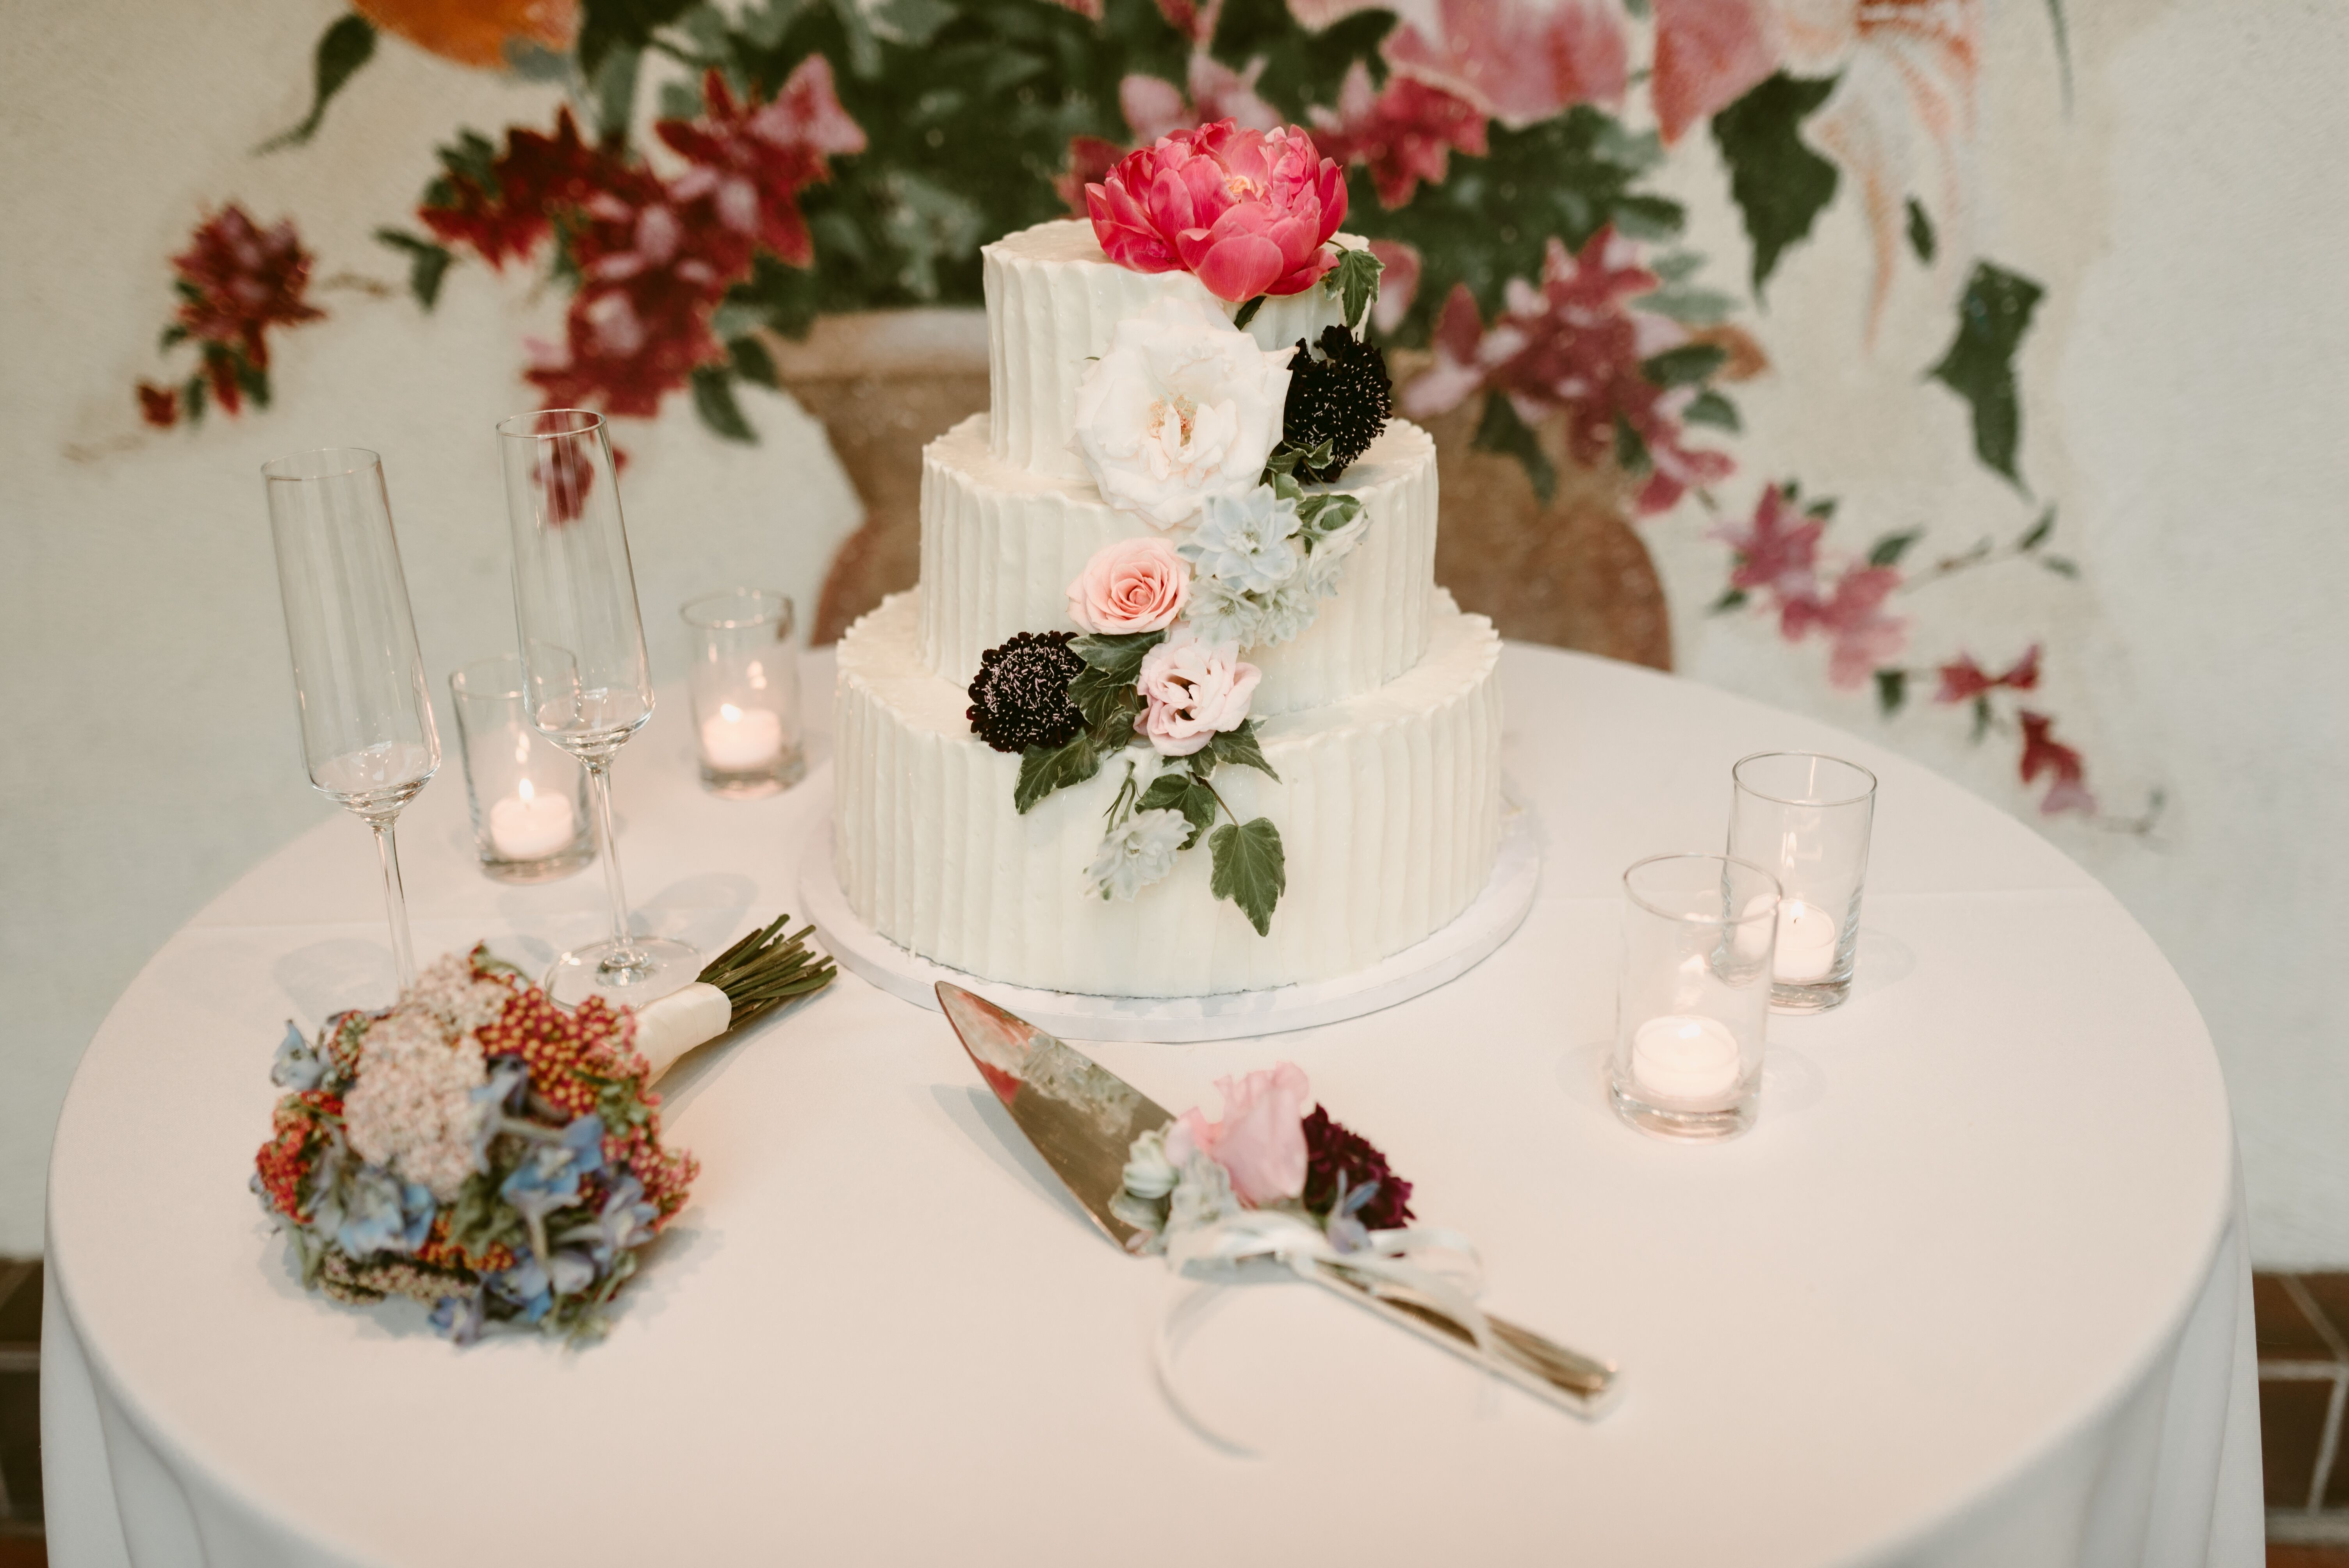 Susiecakes weddings cake tasting table decorations